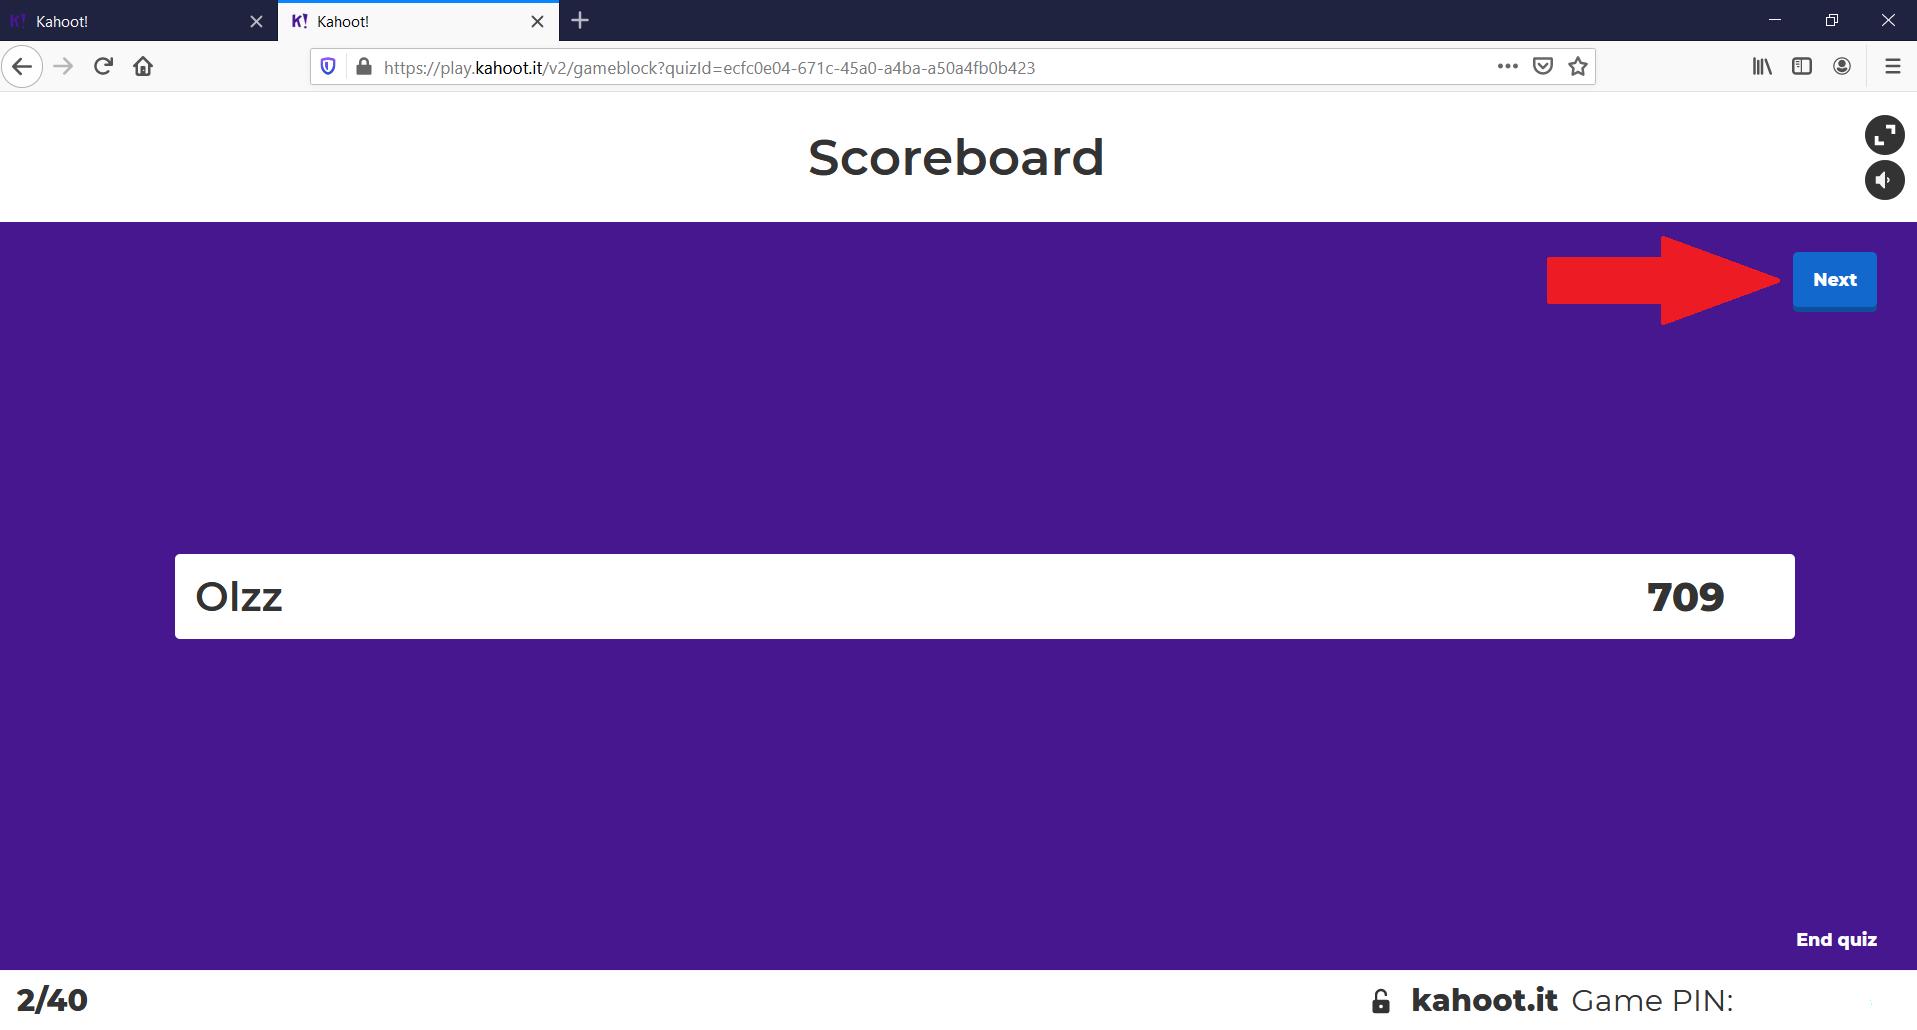 Kahoot quiz scoreboard